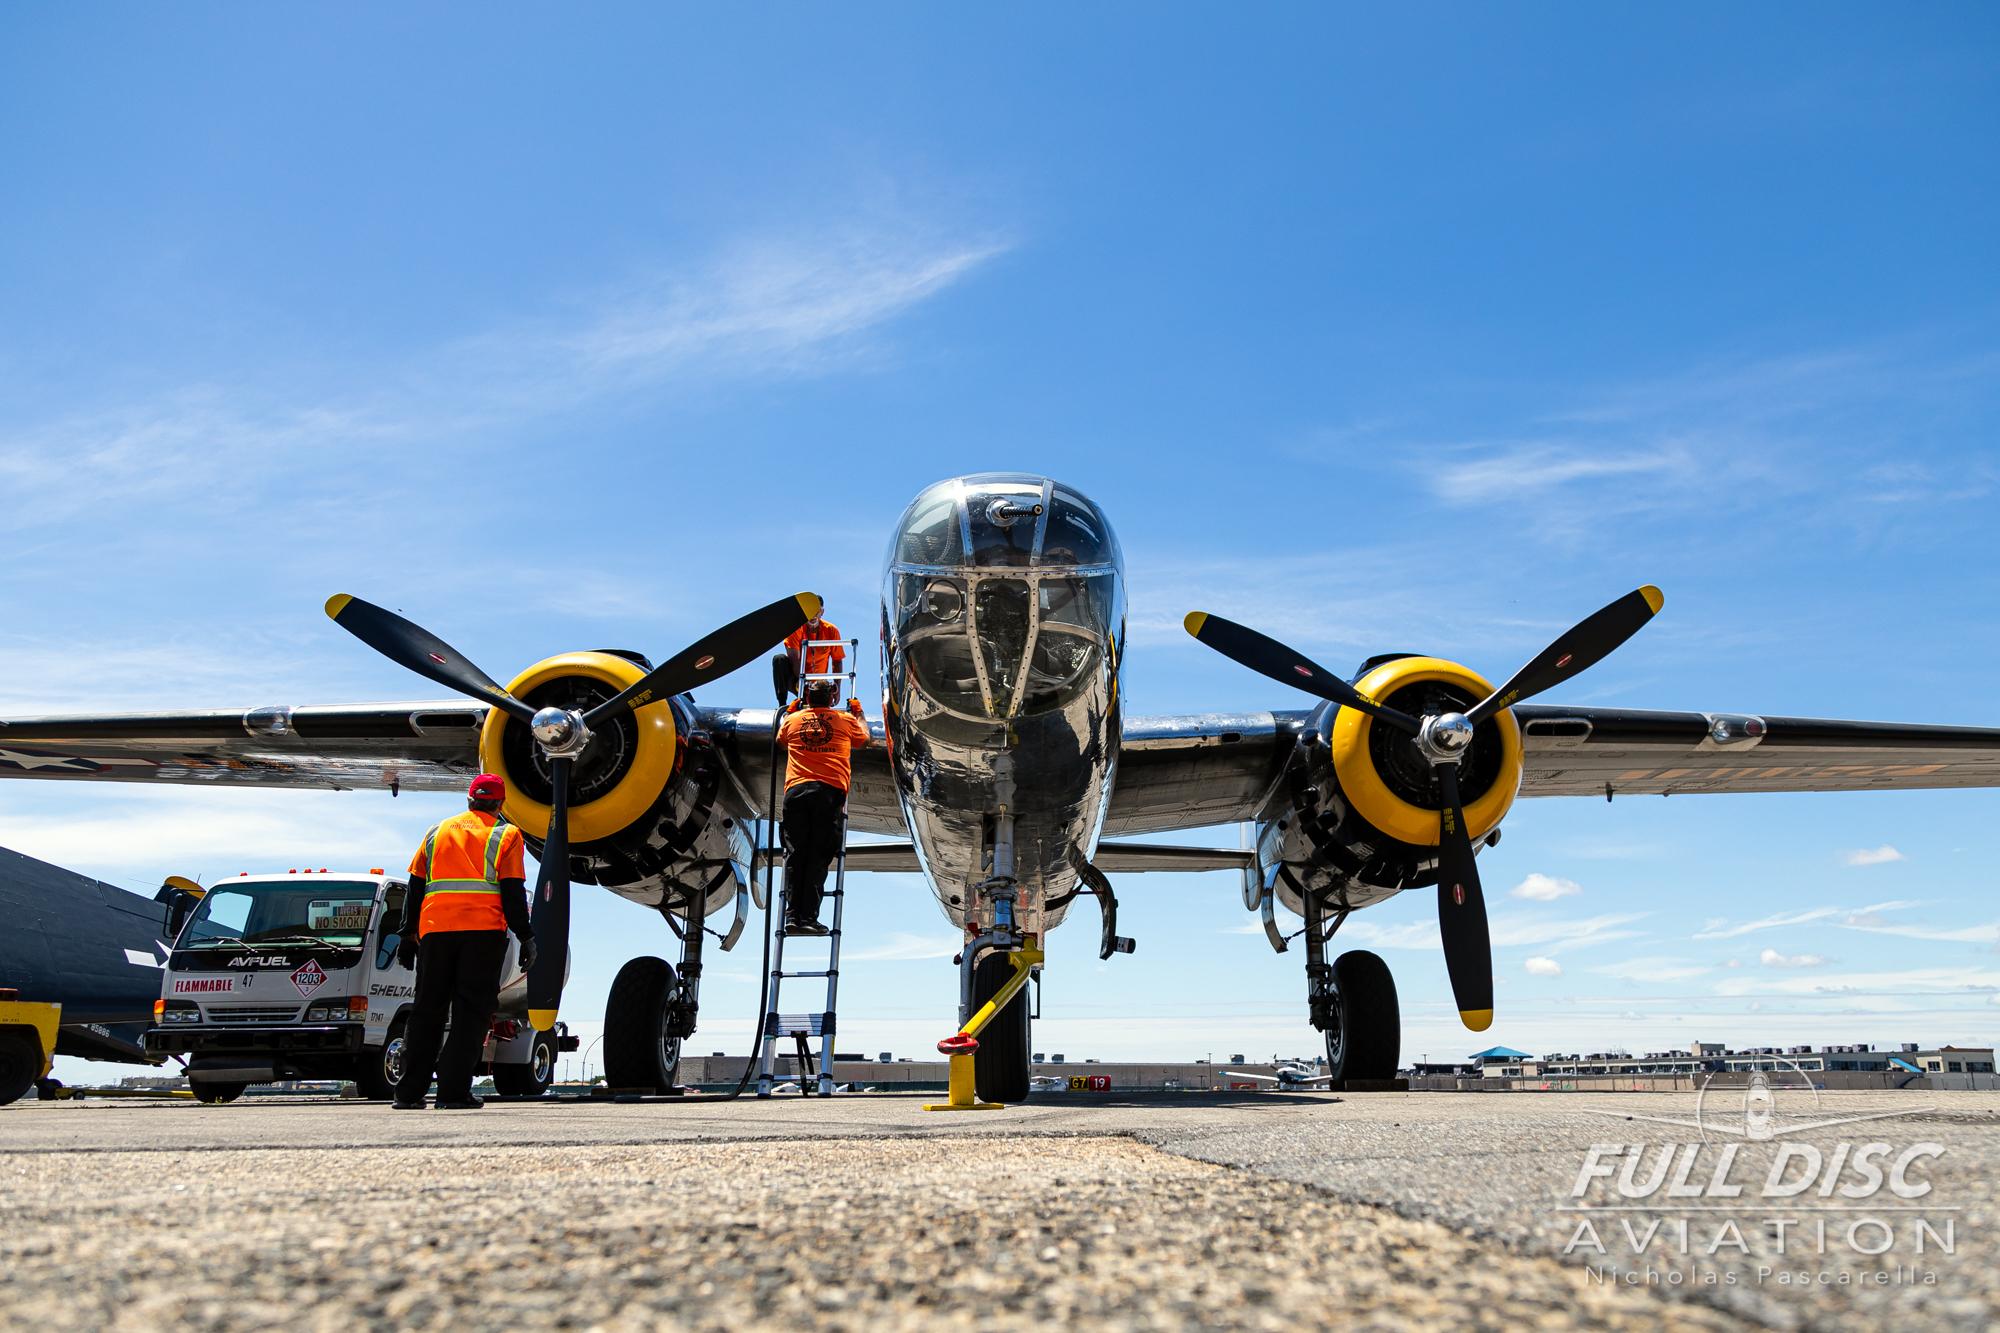 americanairpowermuseum_nicholaspascarella_nickpascarella_fulldiscaviation_legendsofairpower2019_aviation_warbird_b25mitchelbomber_static_headon.jpg